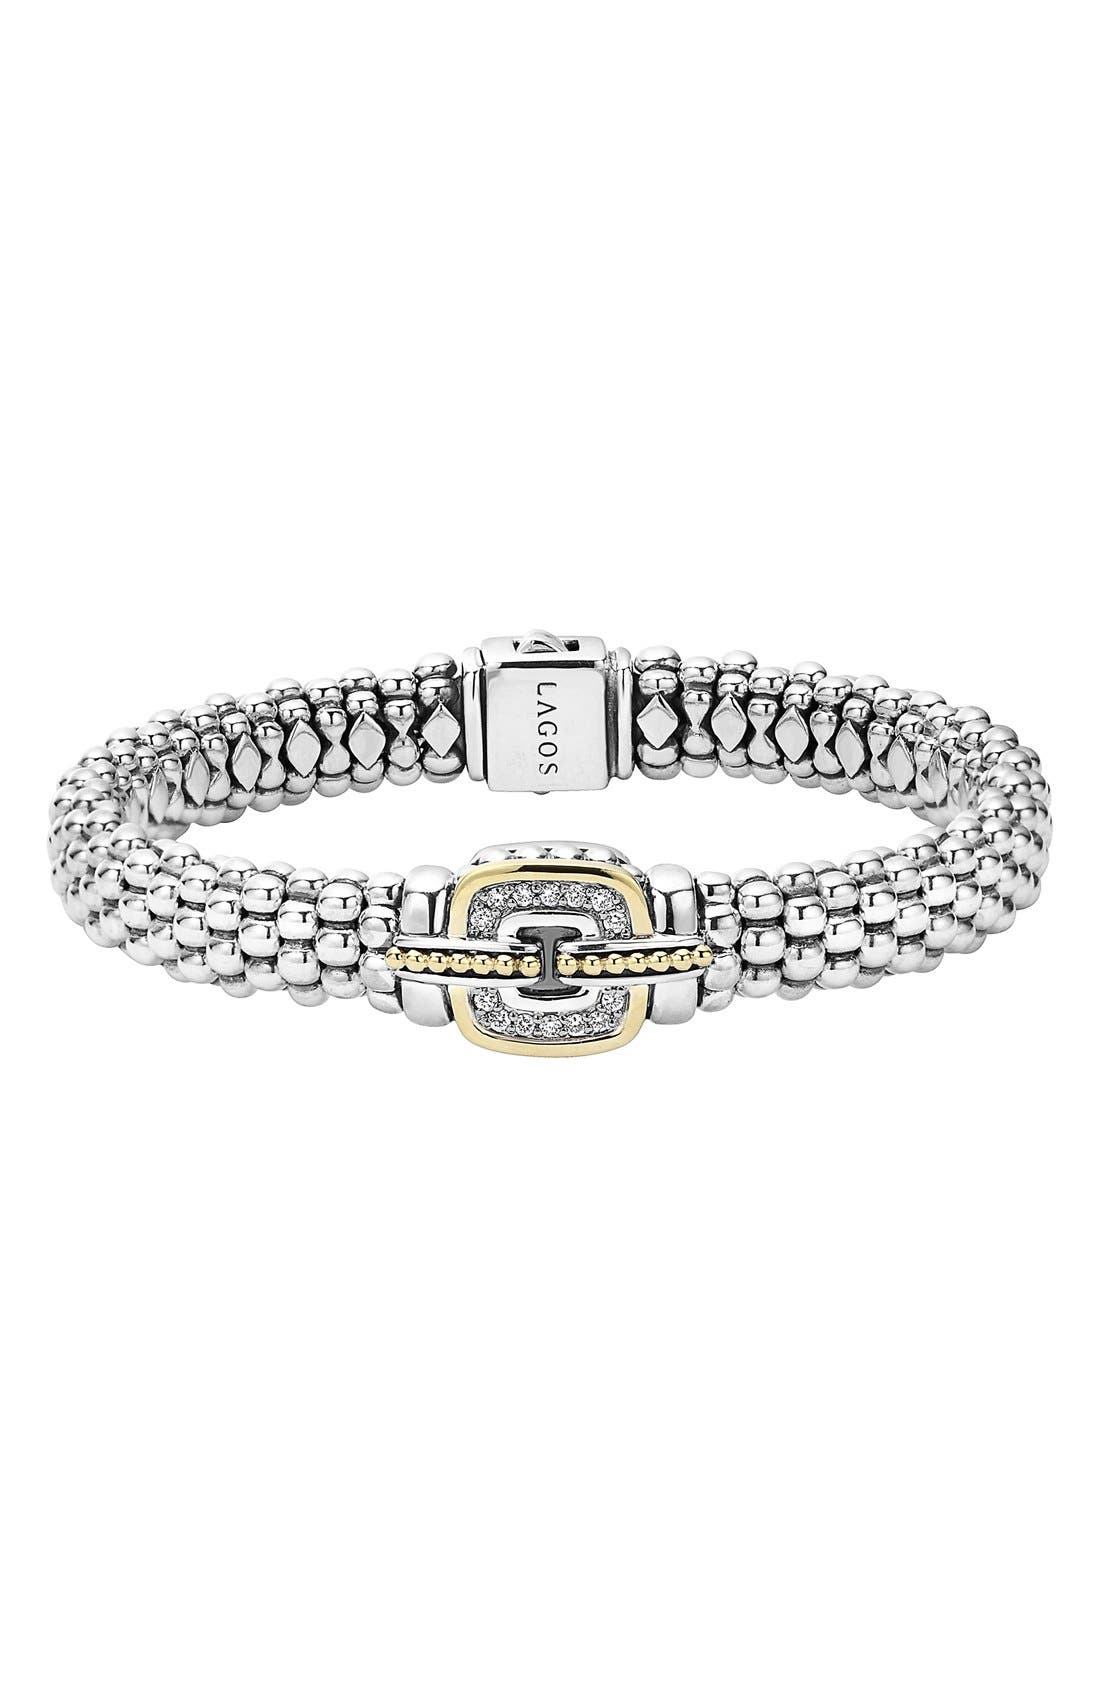 Cushion Caviar Bracelet,                         Main,                         color, Silver/ Gold